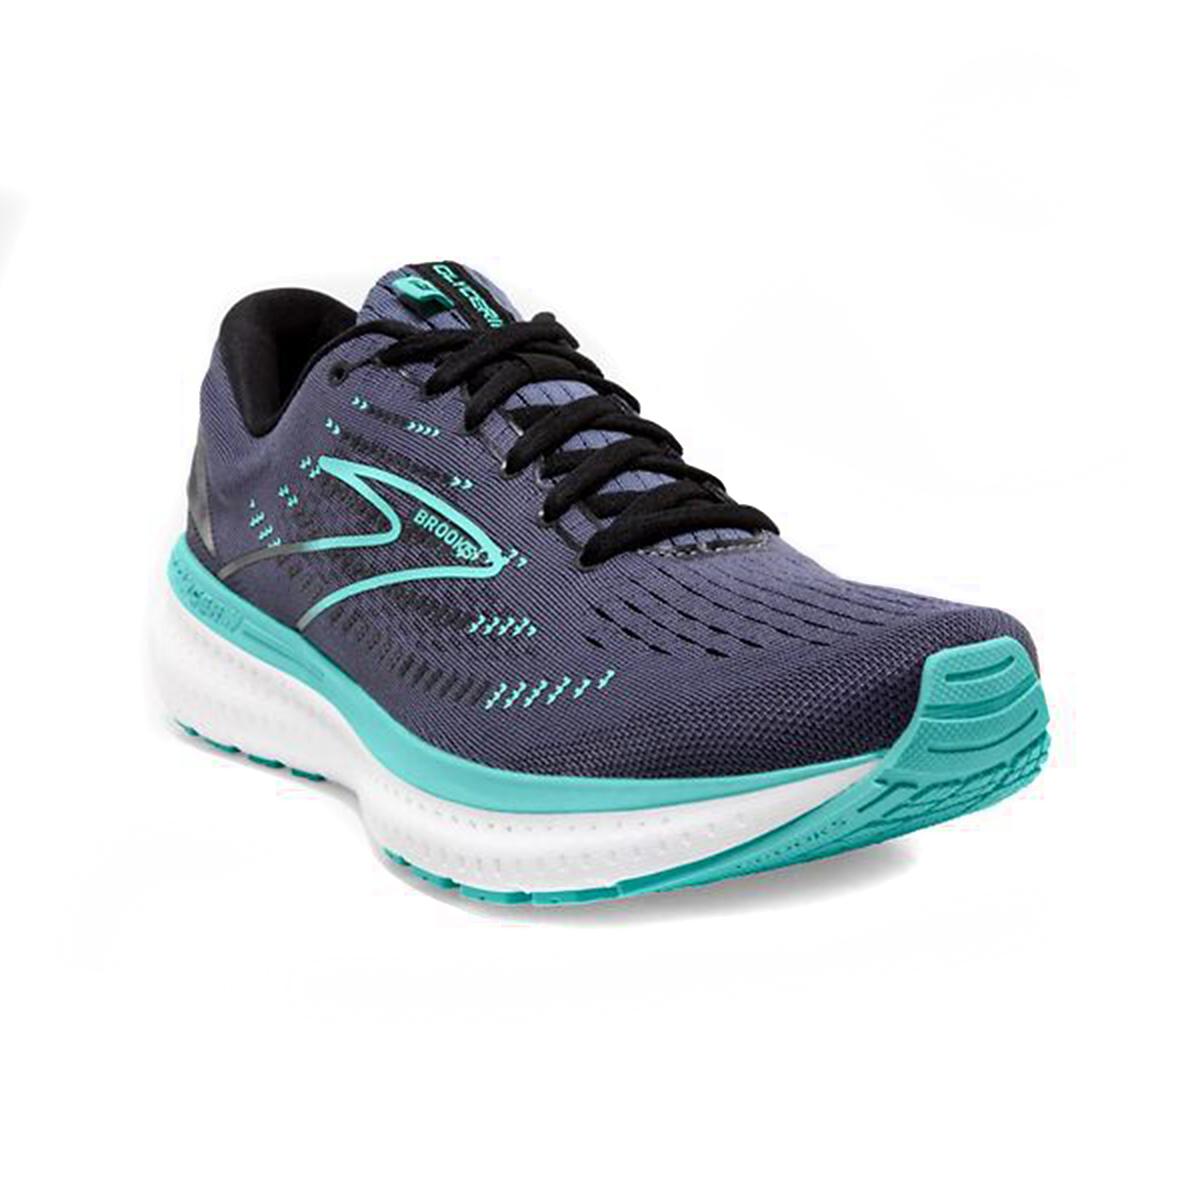 Women's Brooks Glycerin 19 Running Shoe - Color: Nightshadow/Bla - Size: 5 - Width: Regular, Nightshadow/Bla, large, image 3